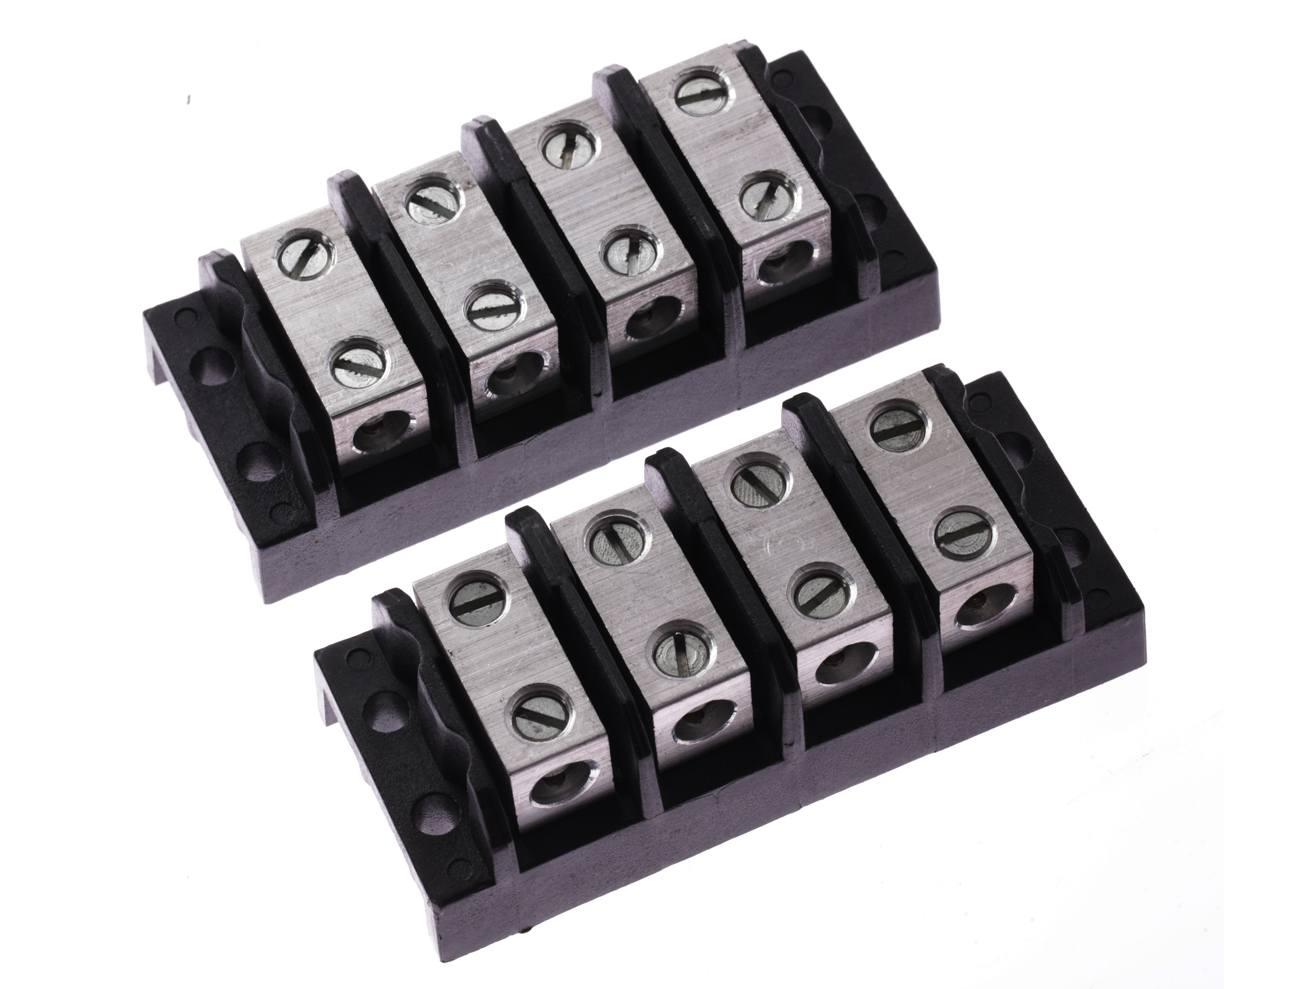 Power Terminal Block : Power splicer terminal blocks taiwan high quality